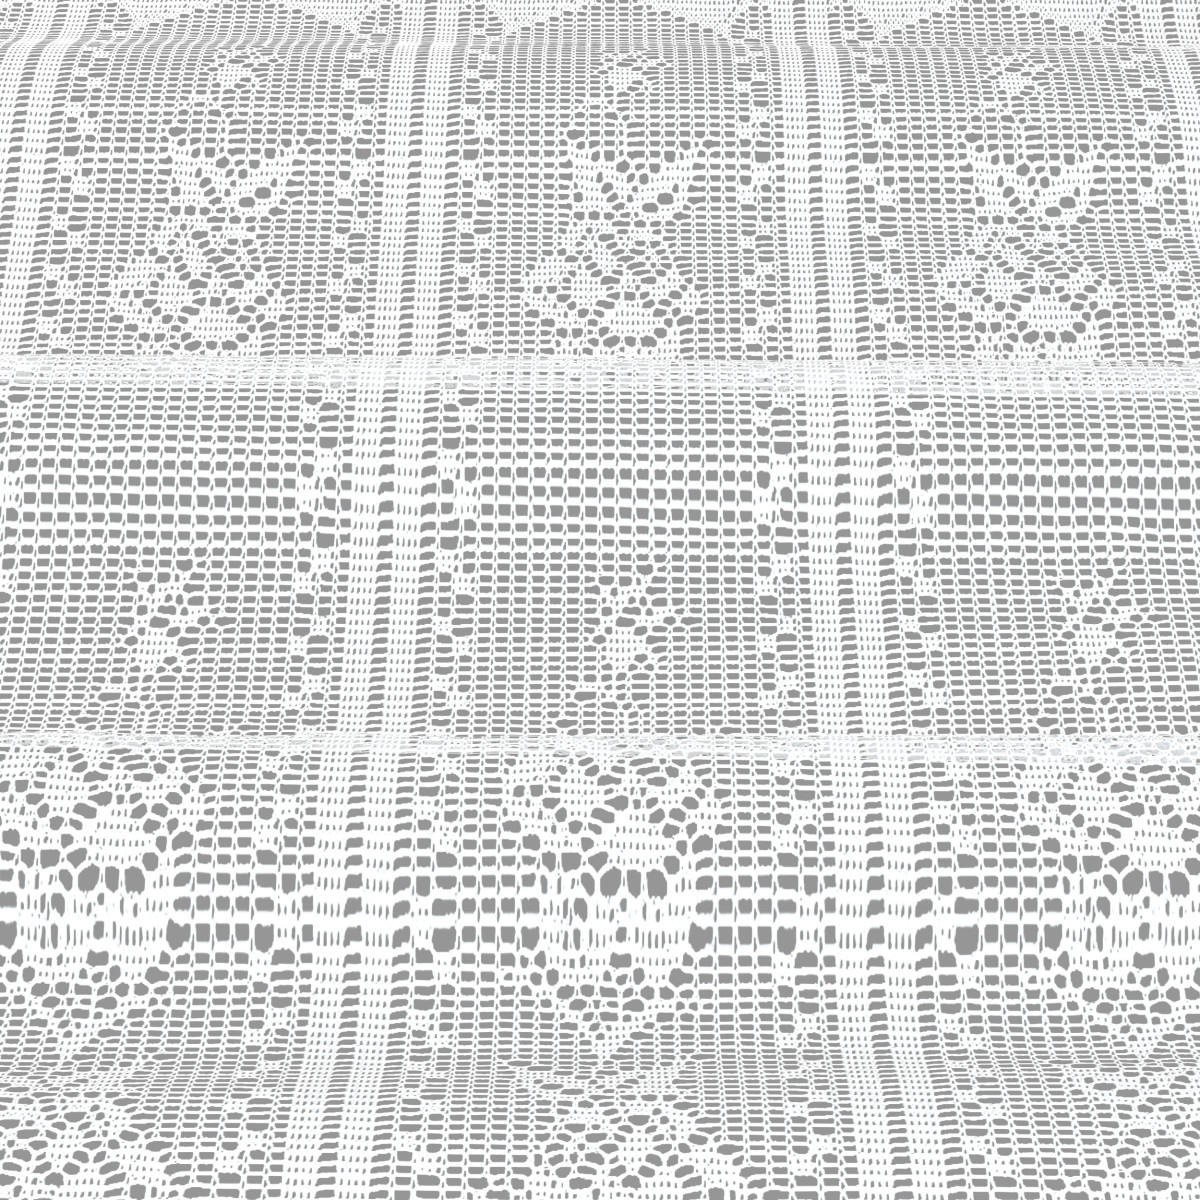 Занавеска Кружева Белый 140Х75 Цвет Белый